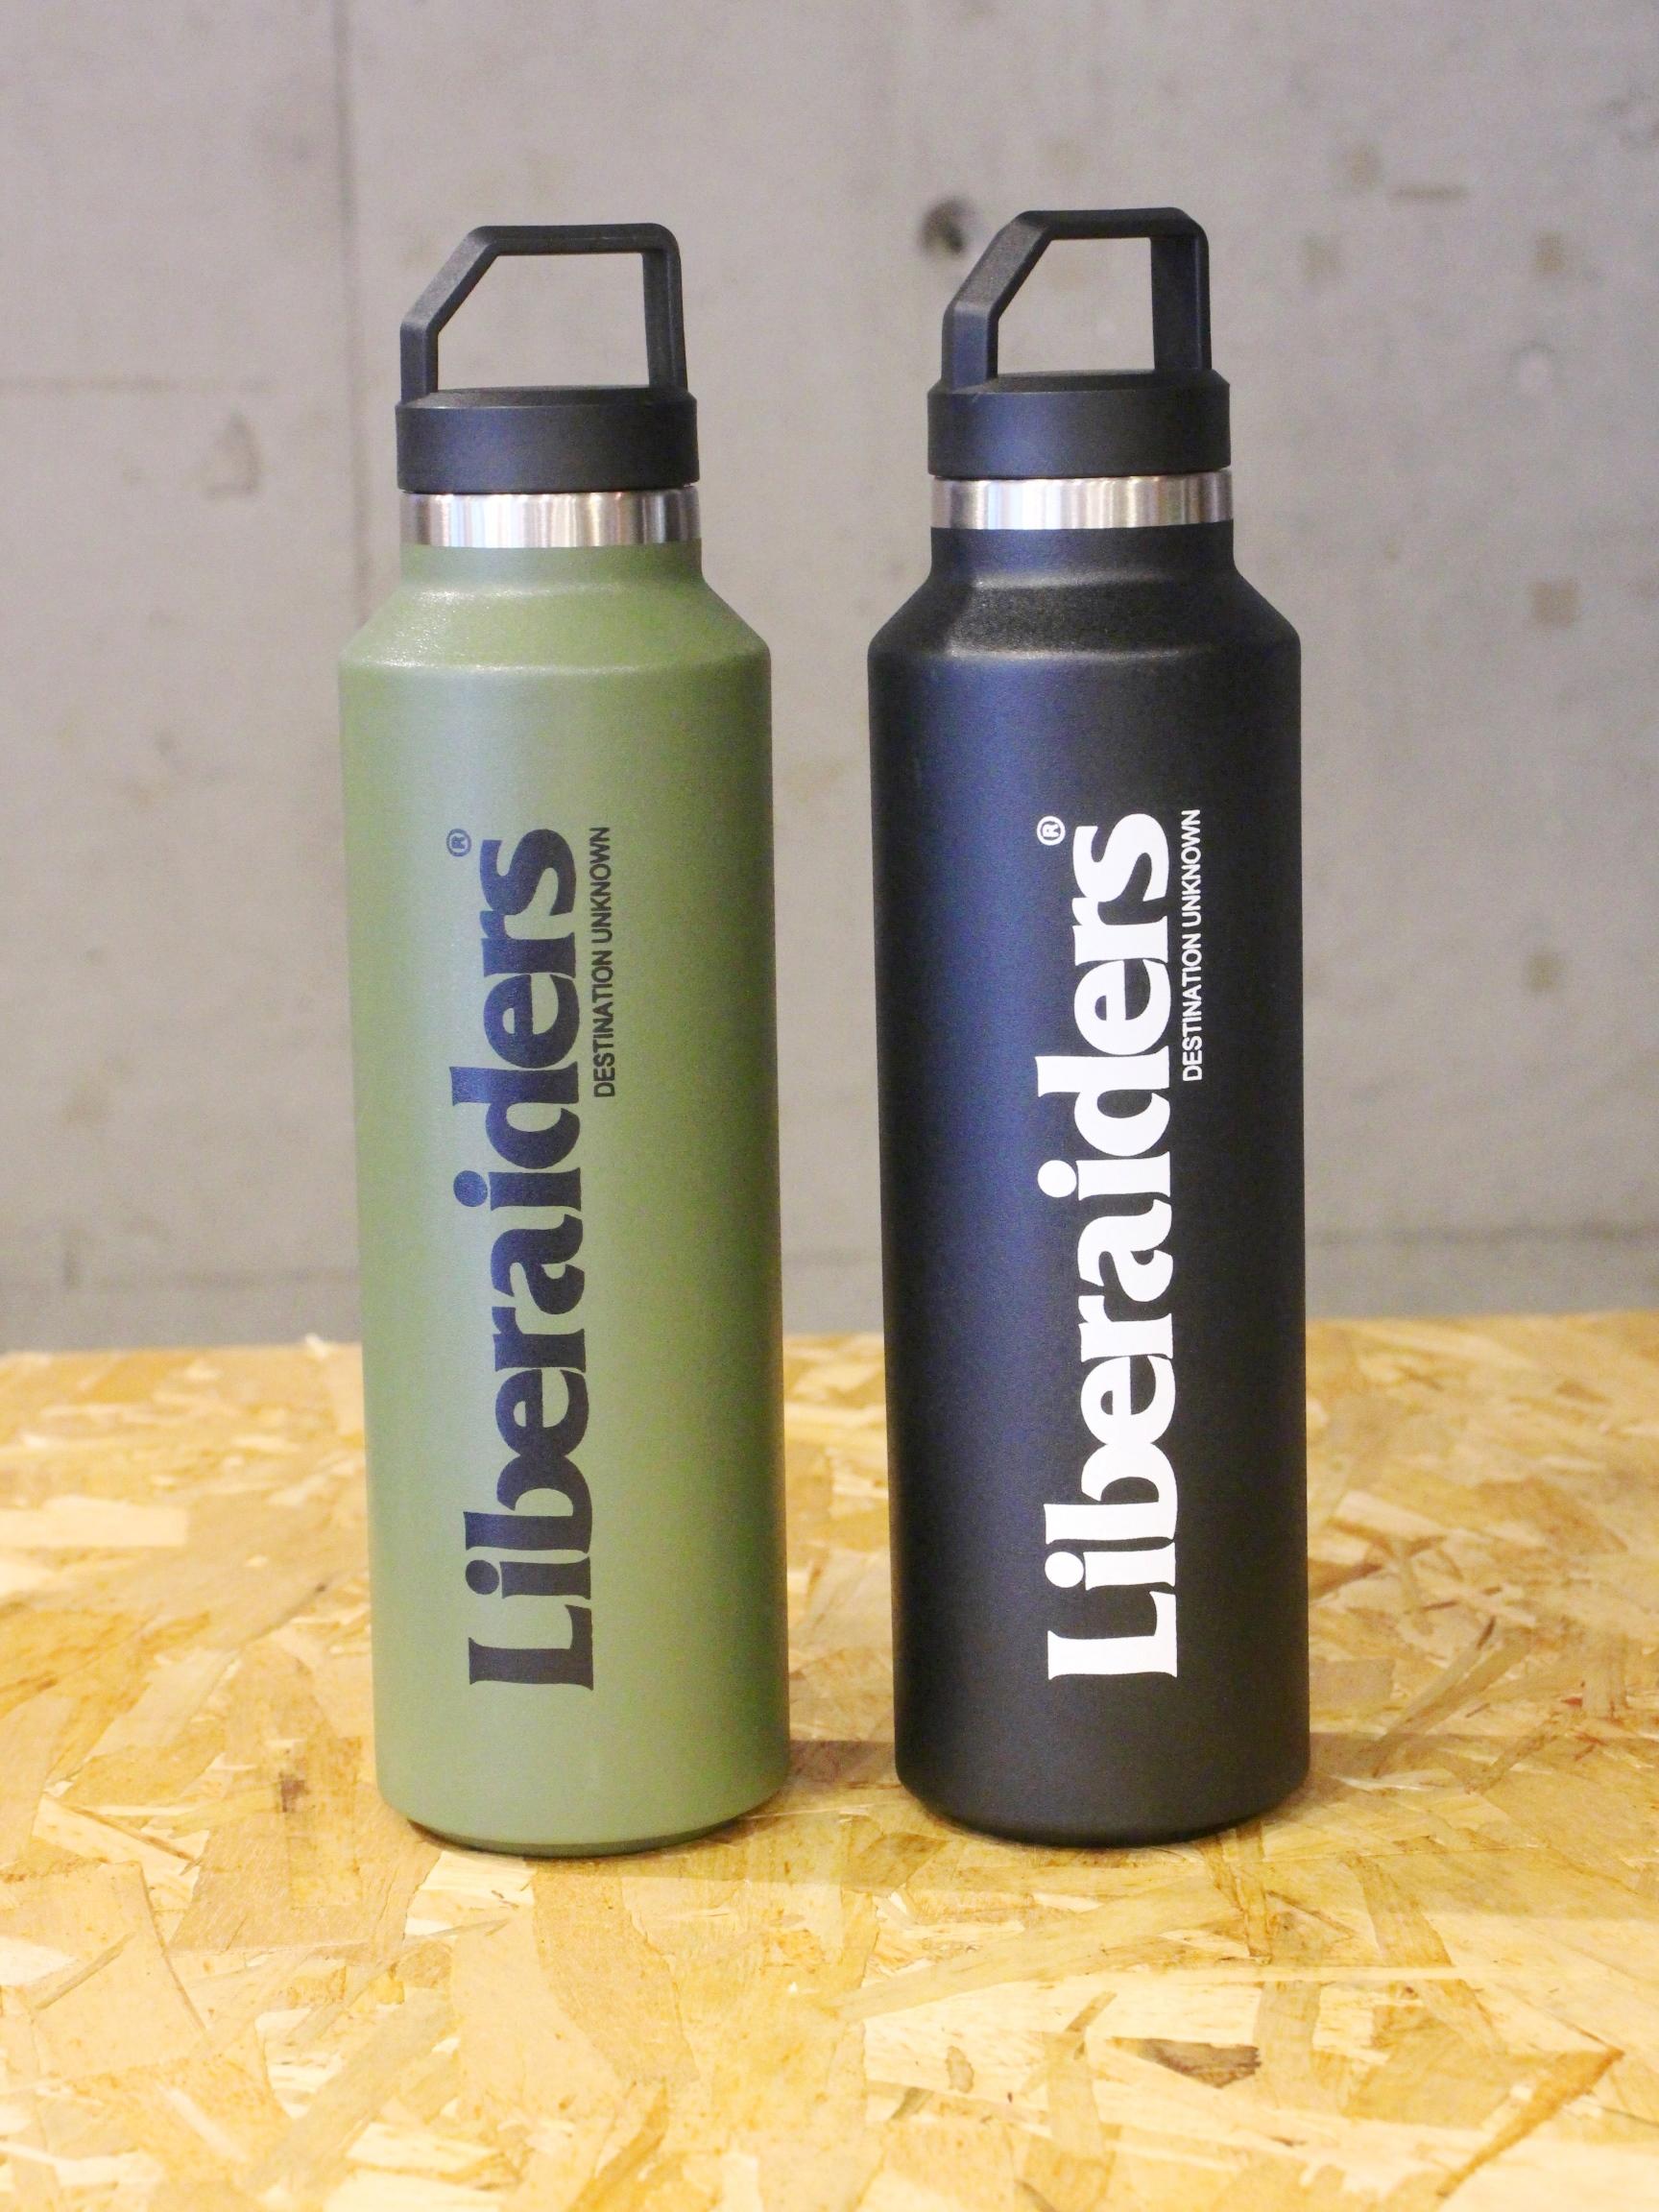 Liberaiders  「 LIBERAIDERS THERMO BOTTLE 」  ステンレス サーモボトル